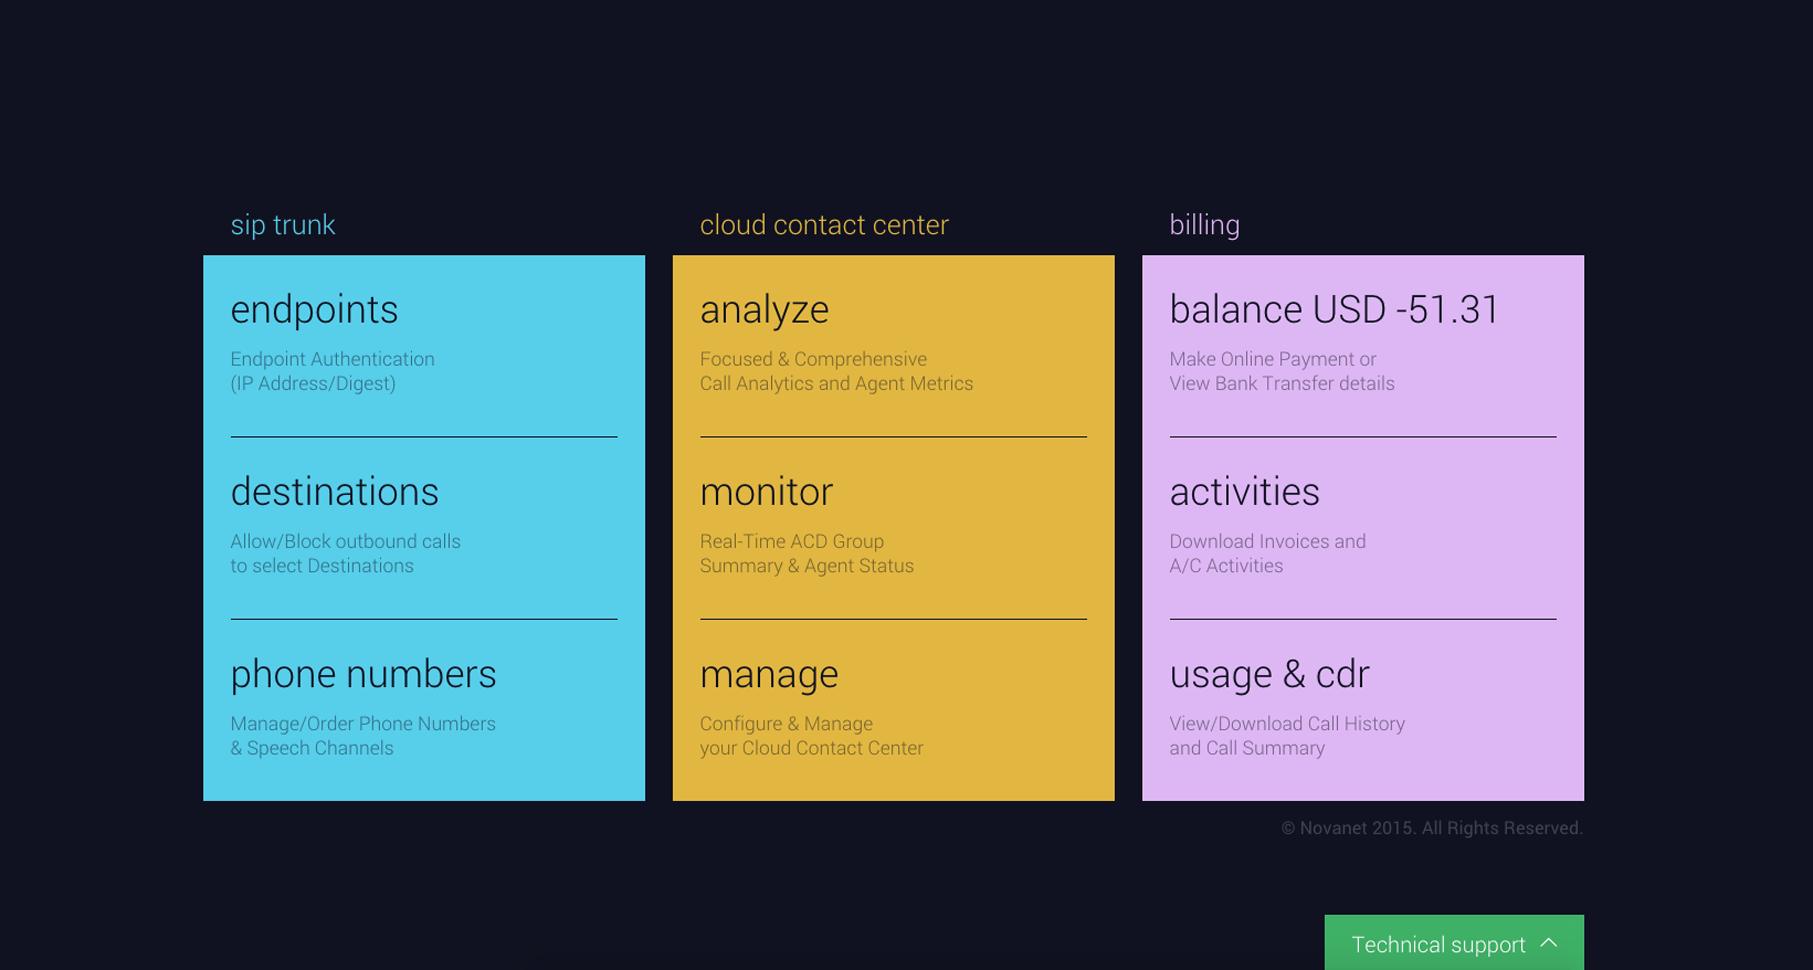 Cloud Contact Center (C3) by Novanet Software - Self-Care Center